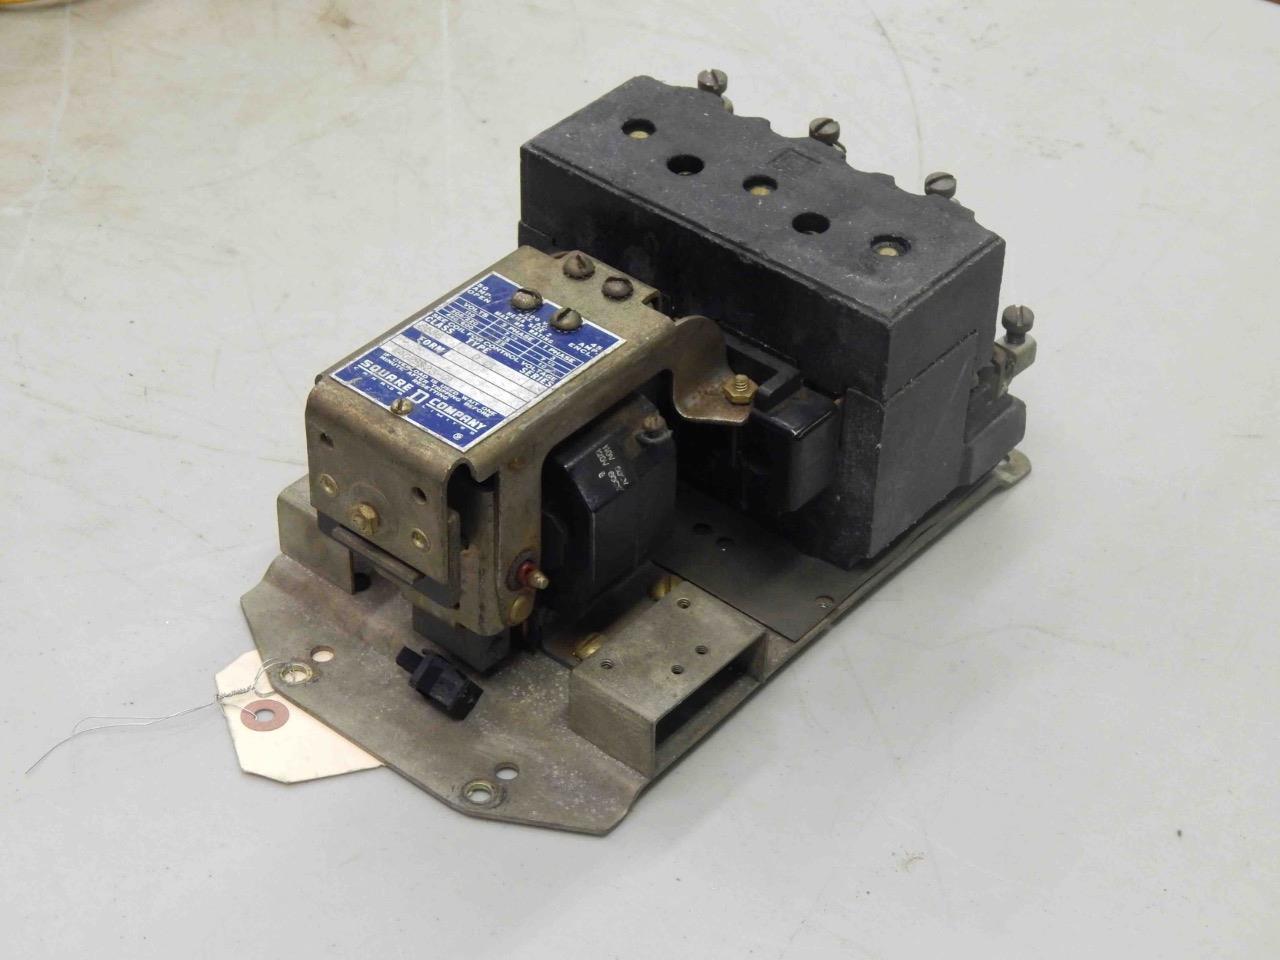 square d 8536 motor starter wiring diagram 3 way light switch multiple lights uk nema size